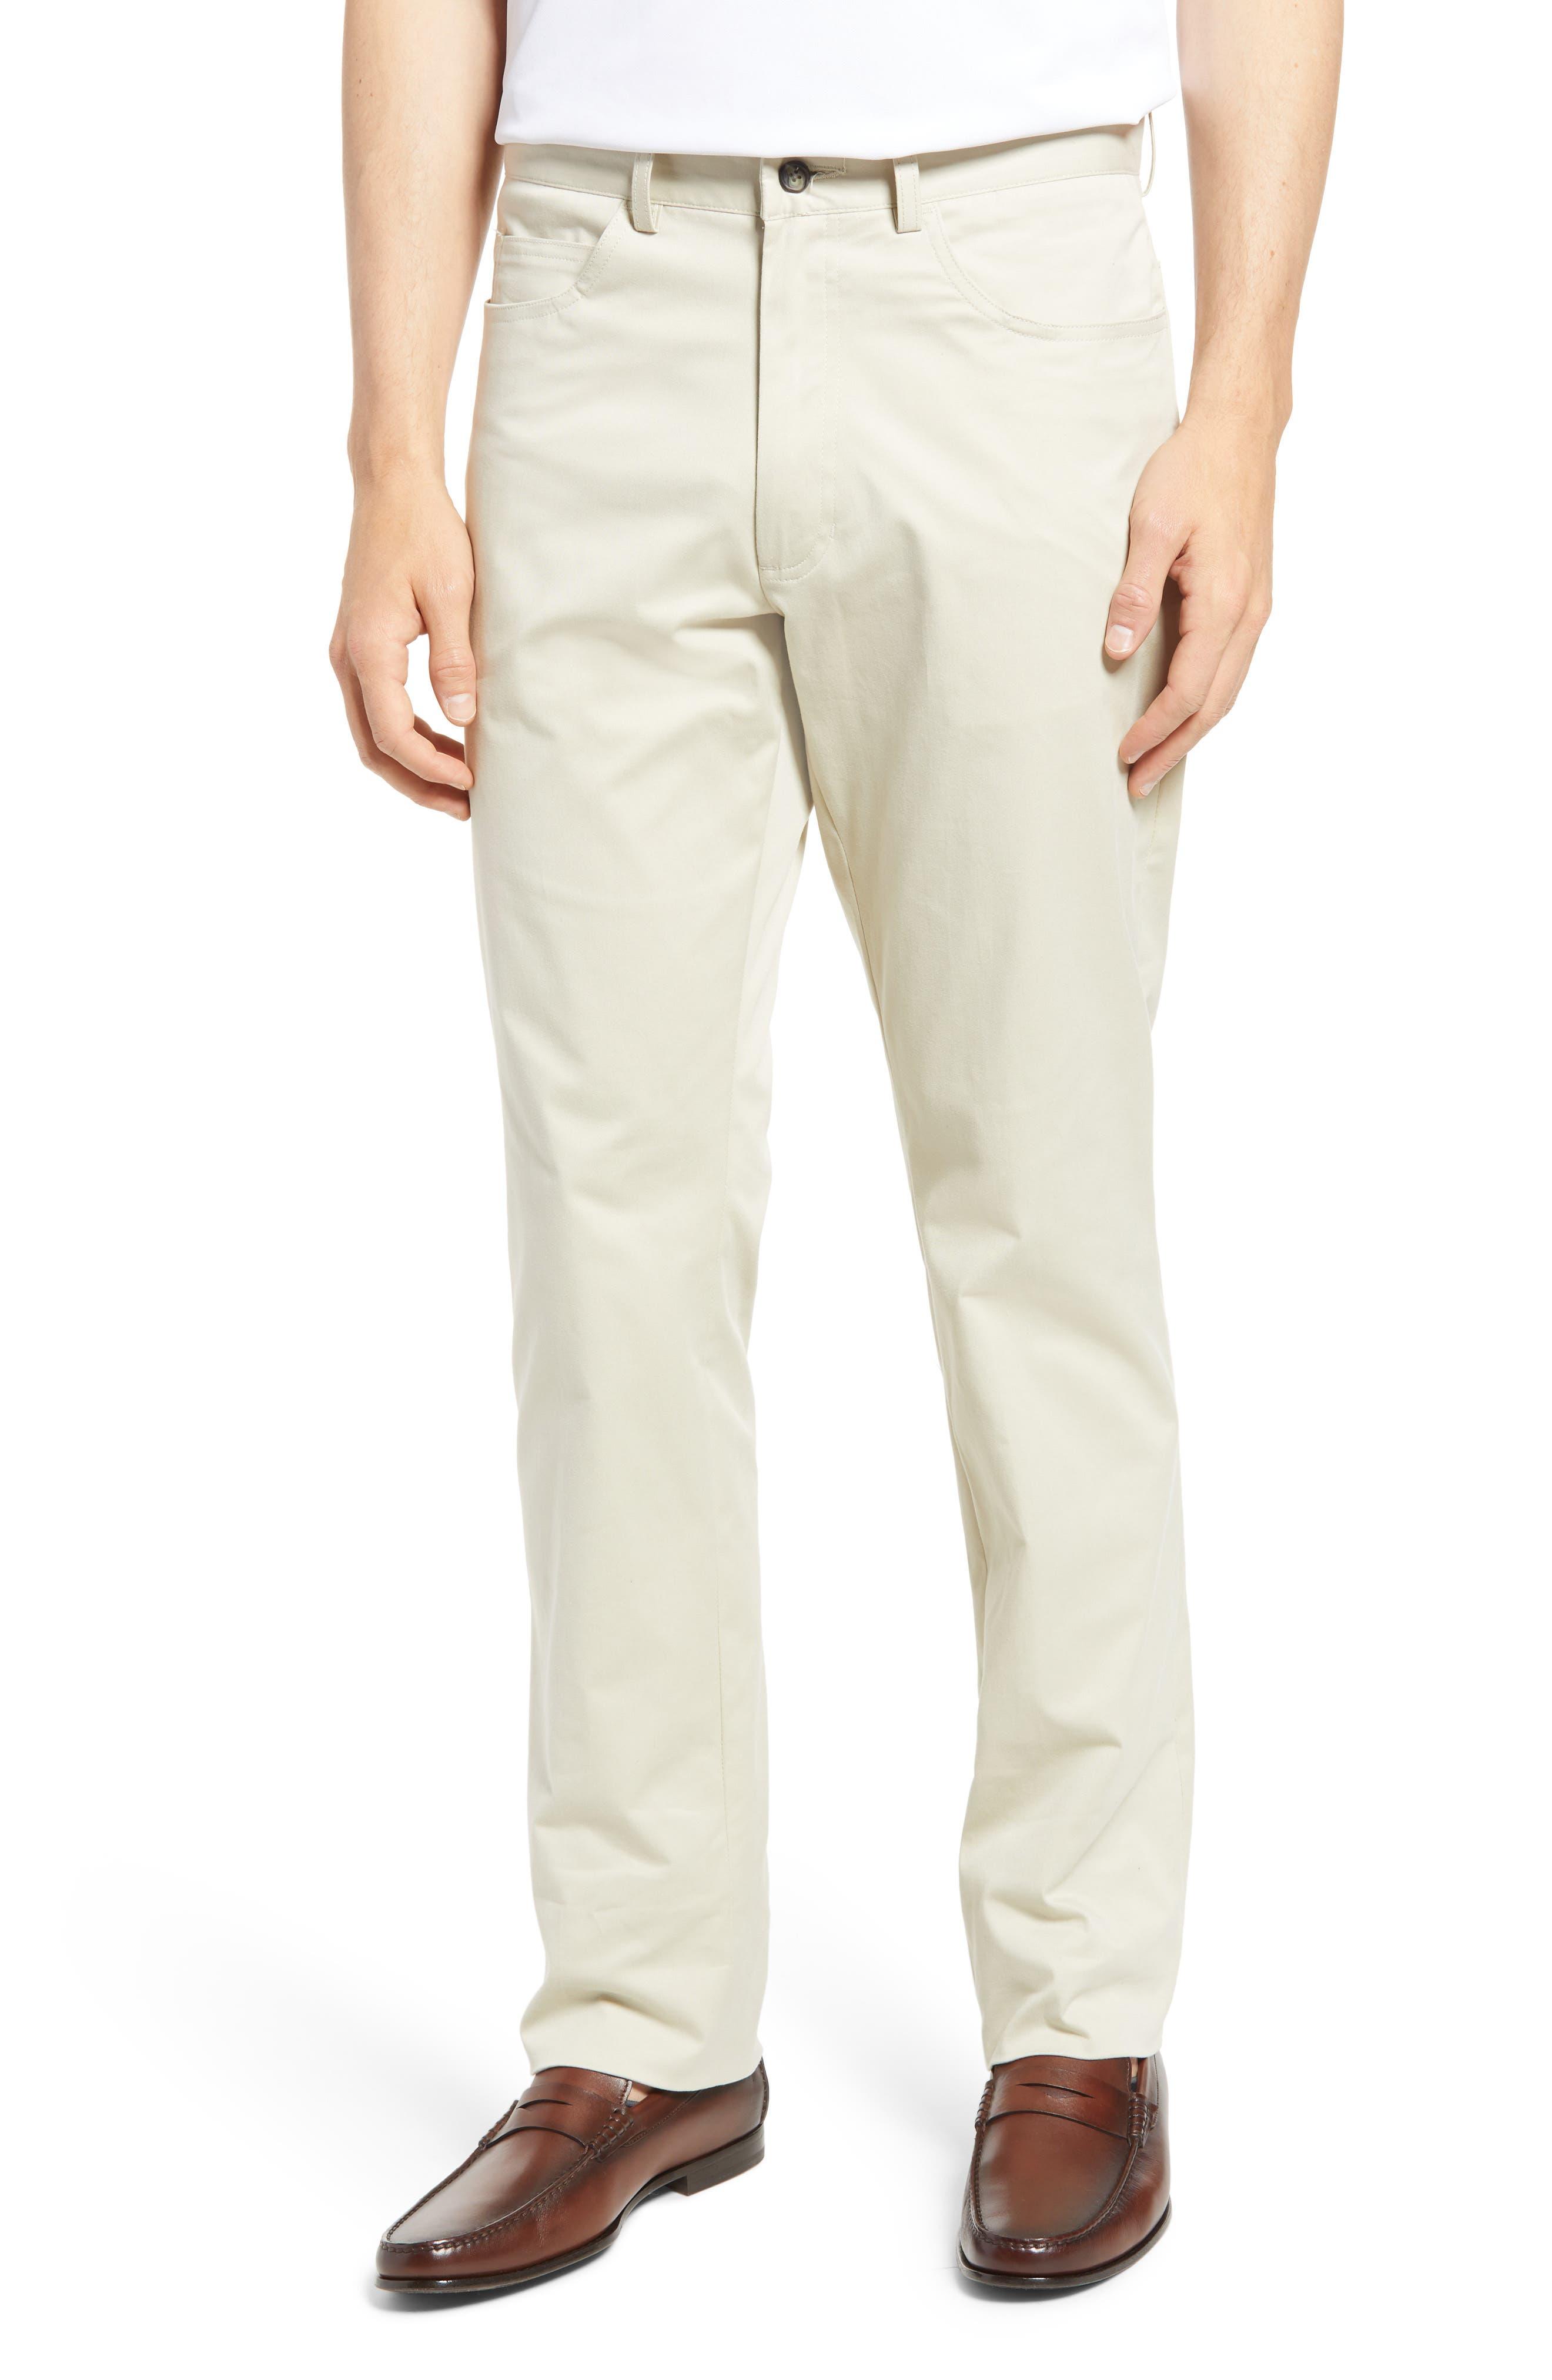 Charleston Stretch Cotton Chino Pants